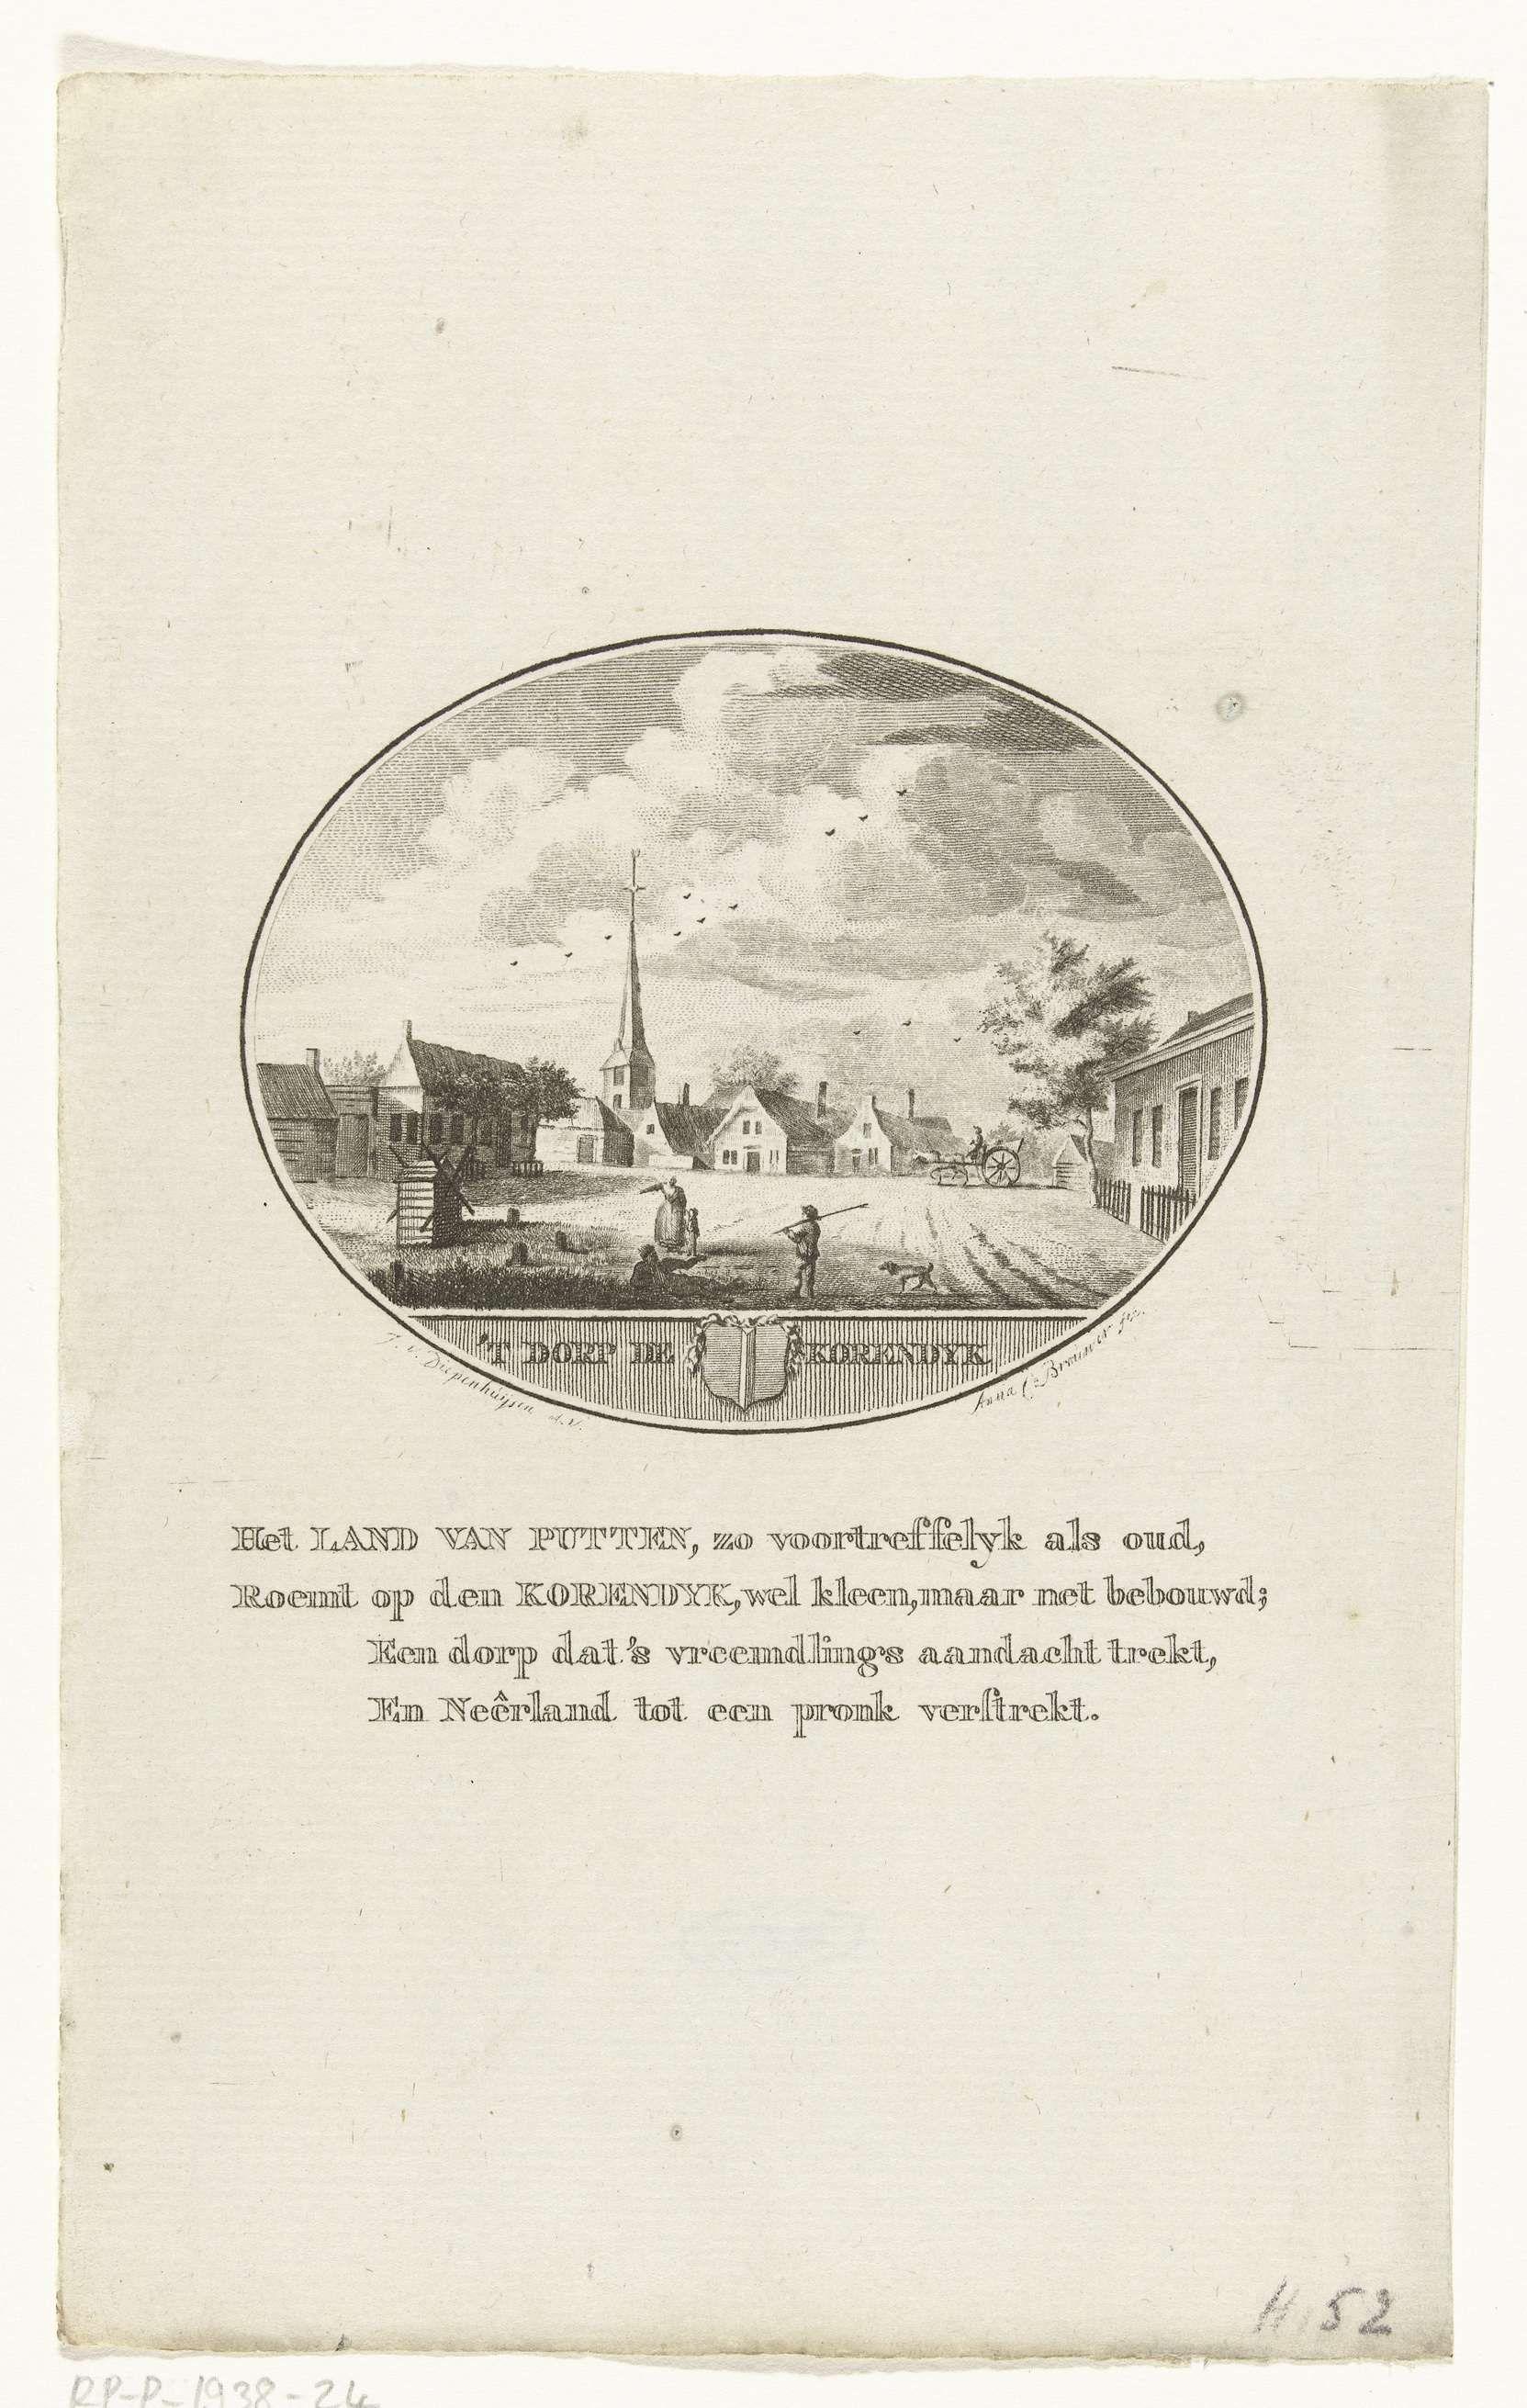 Anna Catharina Brouwer   Gezicht op het dorpsplein van Goudswaard, Anna Catharina Brouwer, 1791 - 1793  